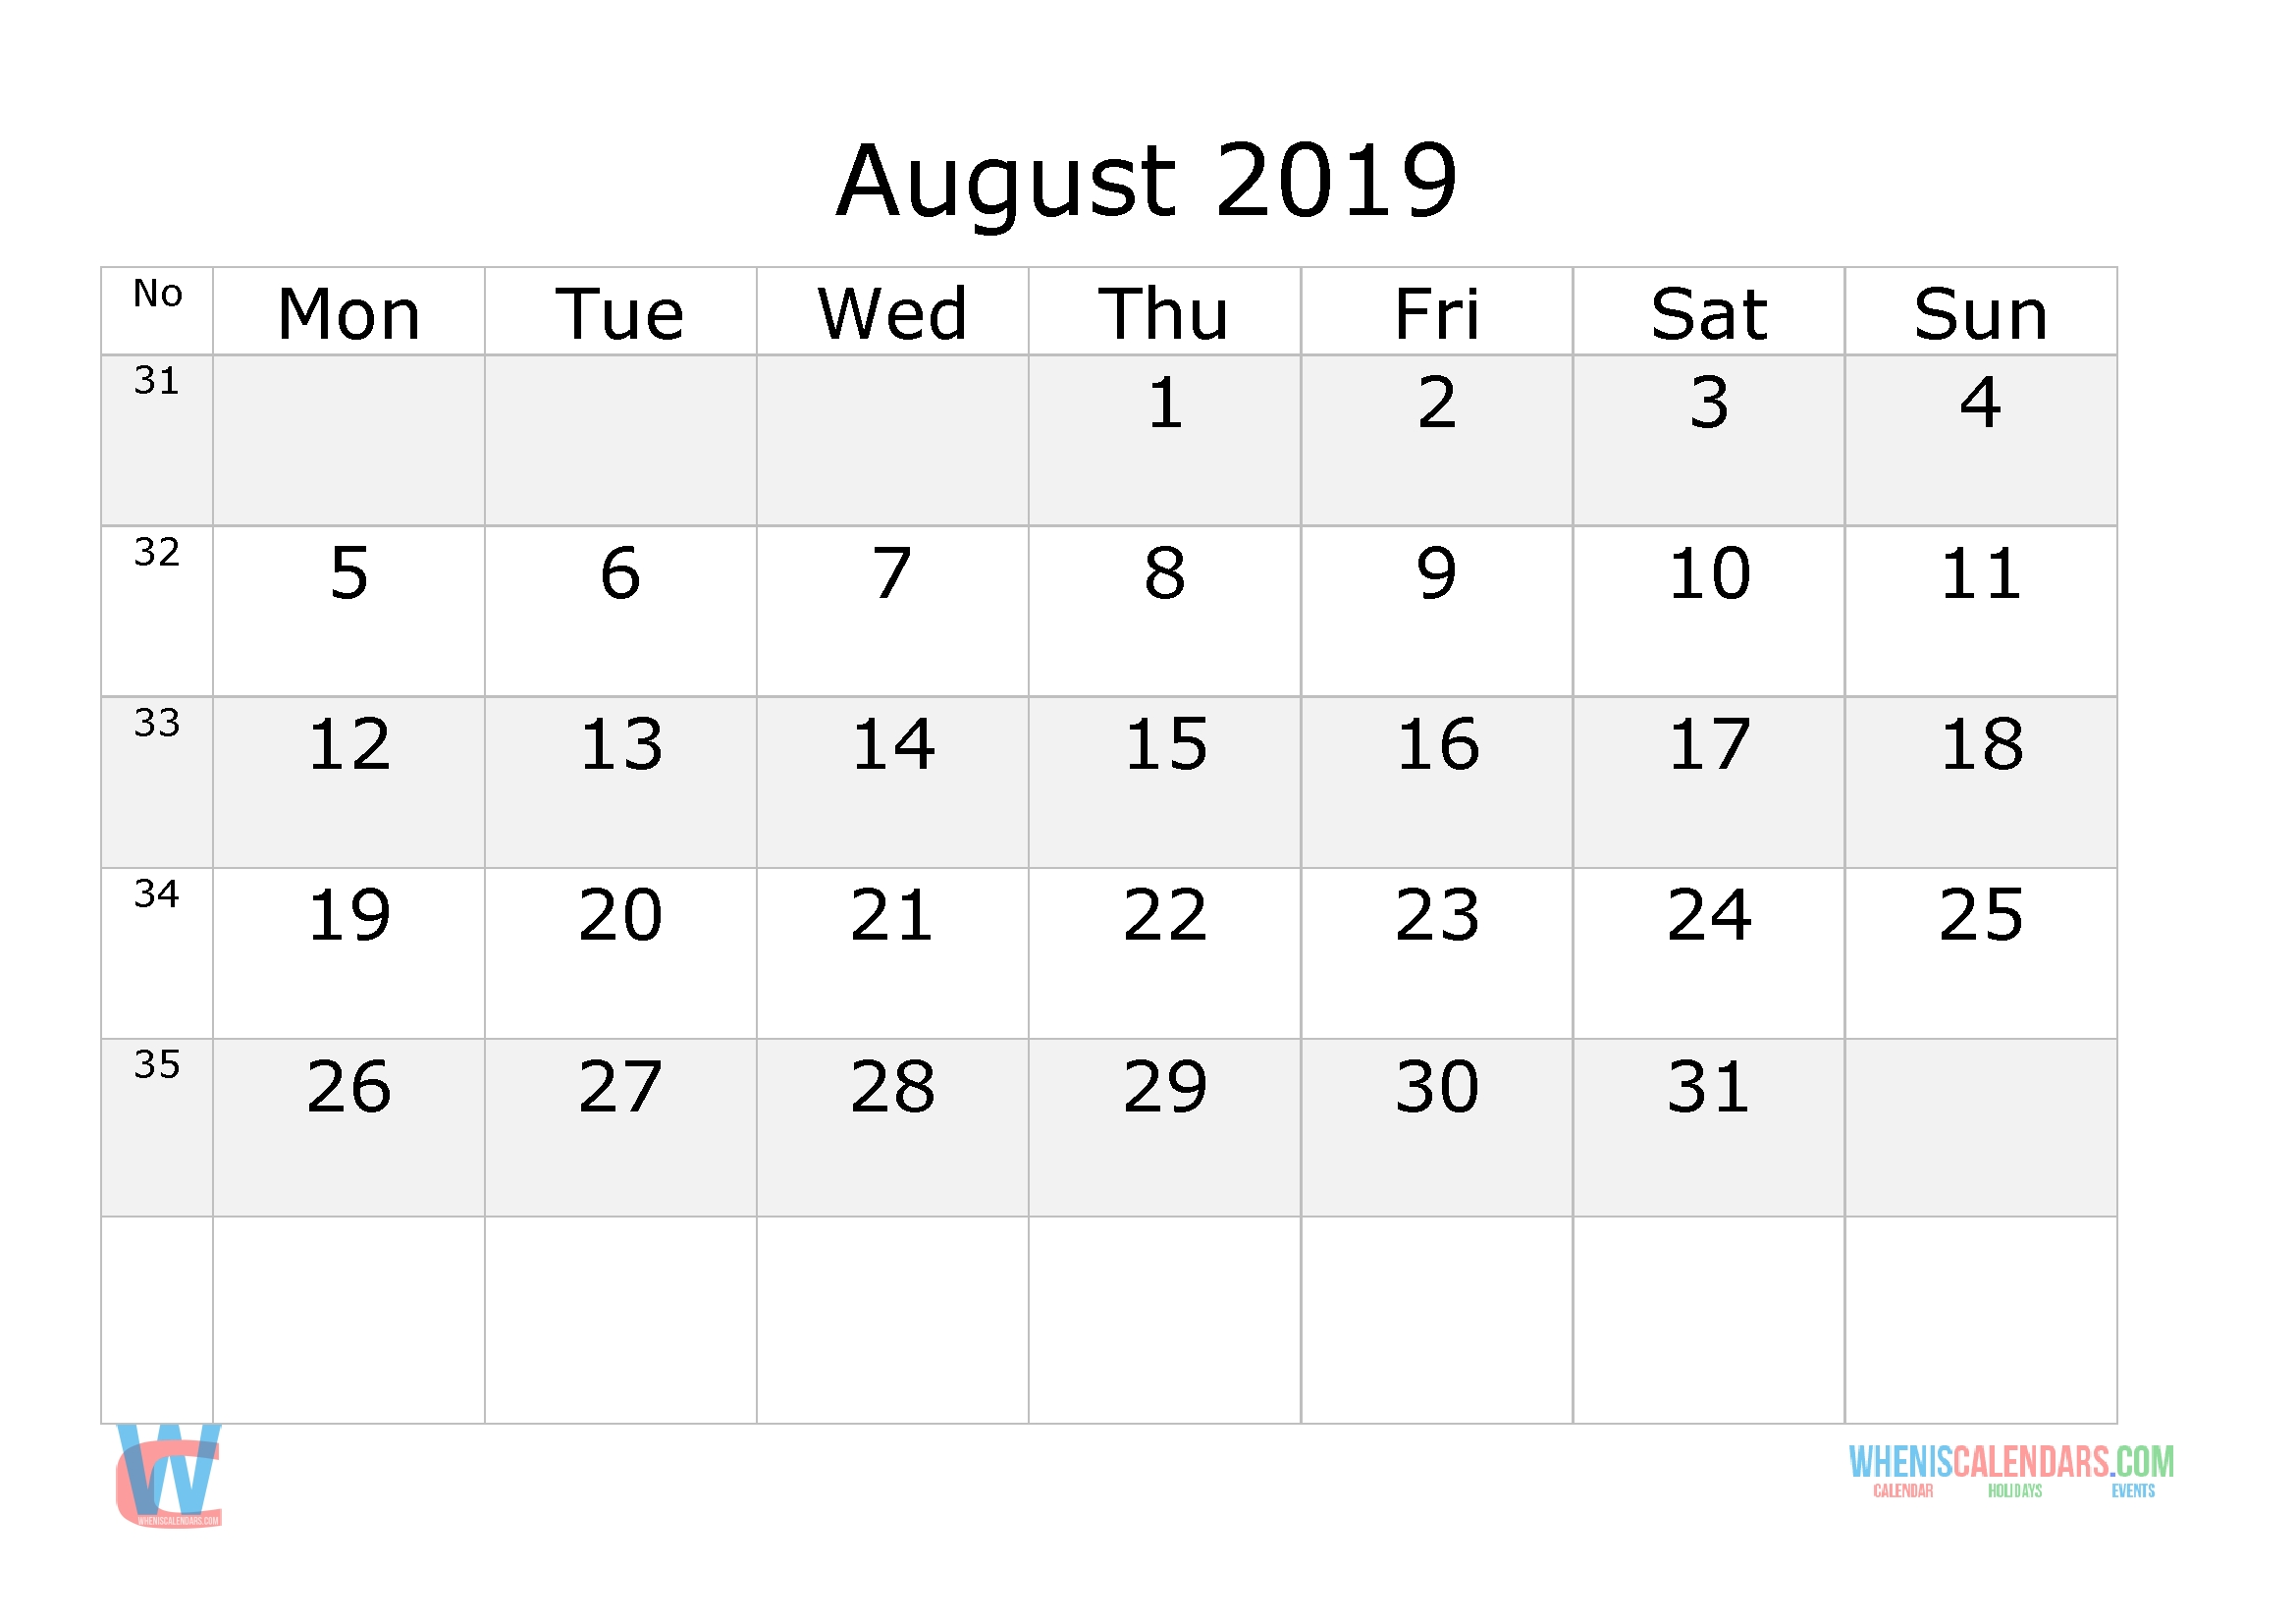 August 2019 Calendar With Week Numbers Printable, Startmonday 8 August 2019 Calendar